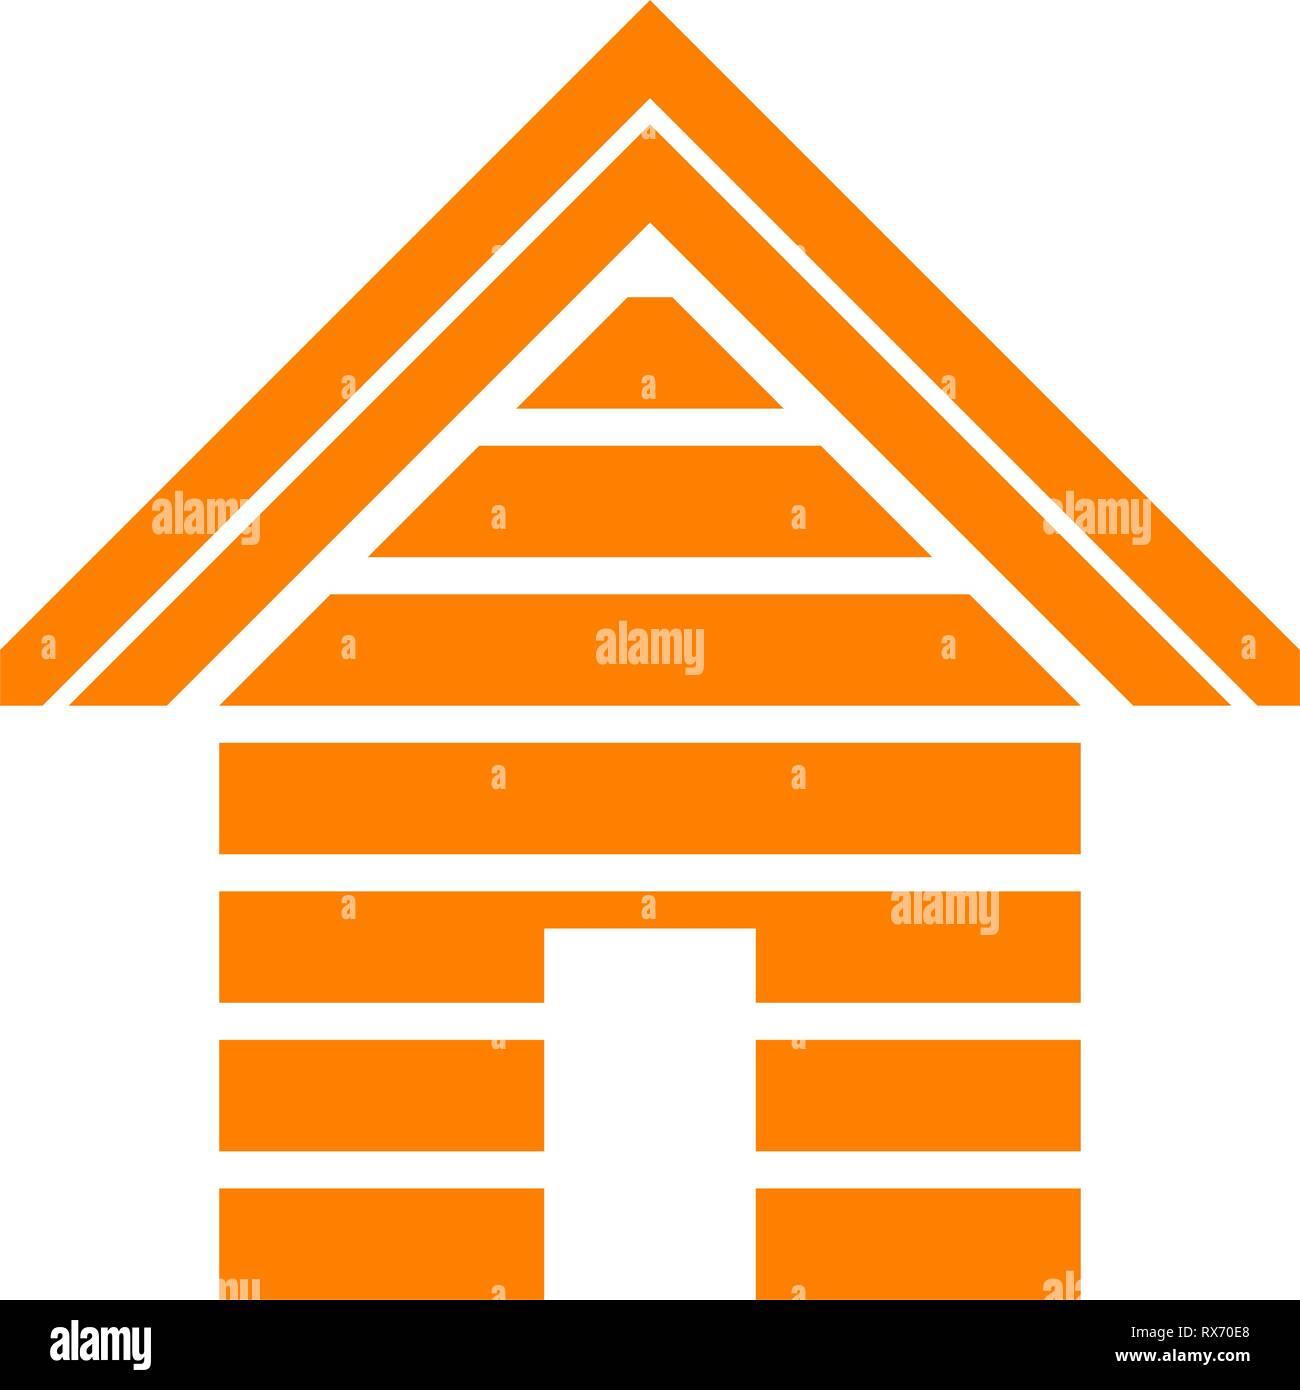 Home symbol icon - orange striped, isolated - vector illustration - Stock Vector